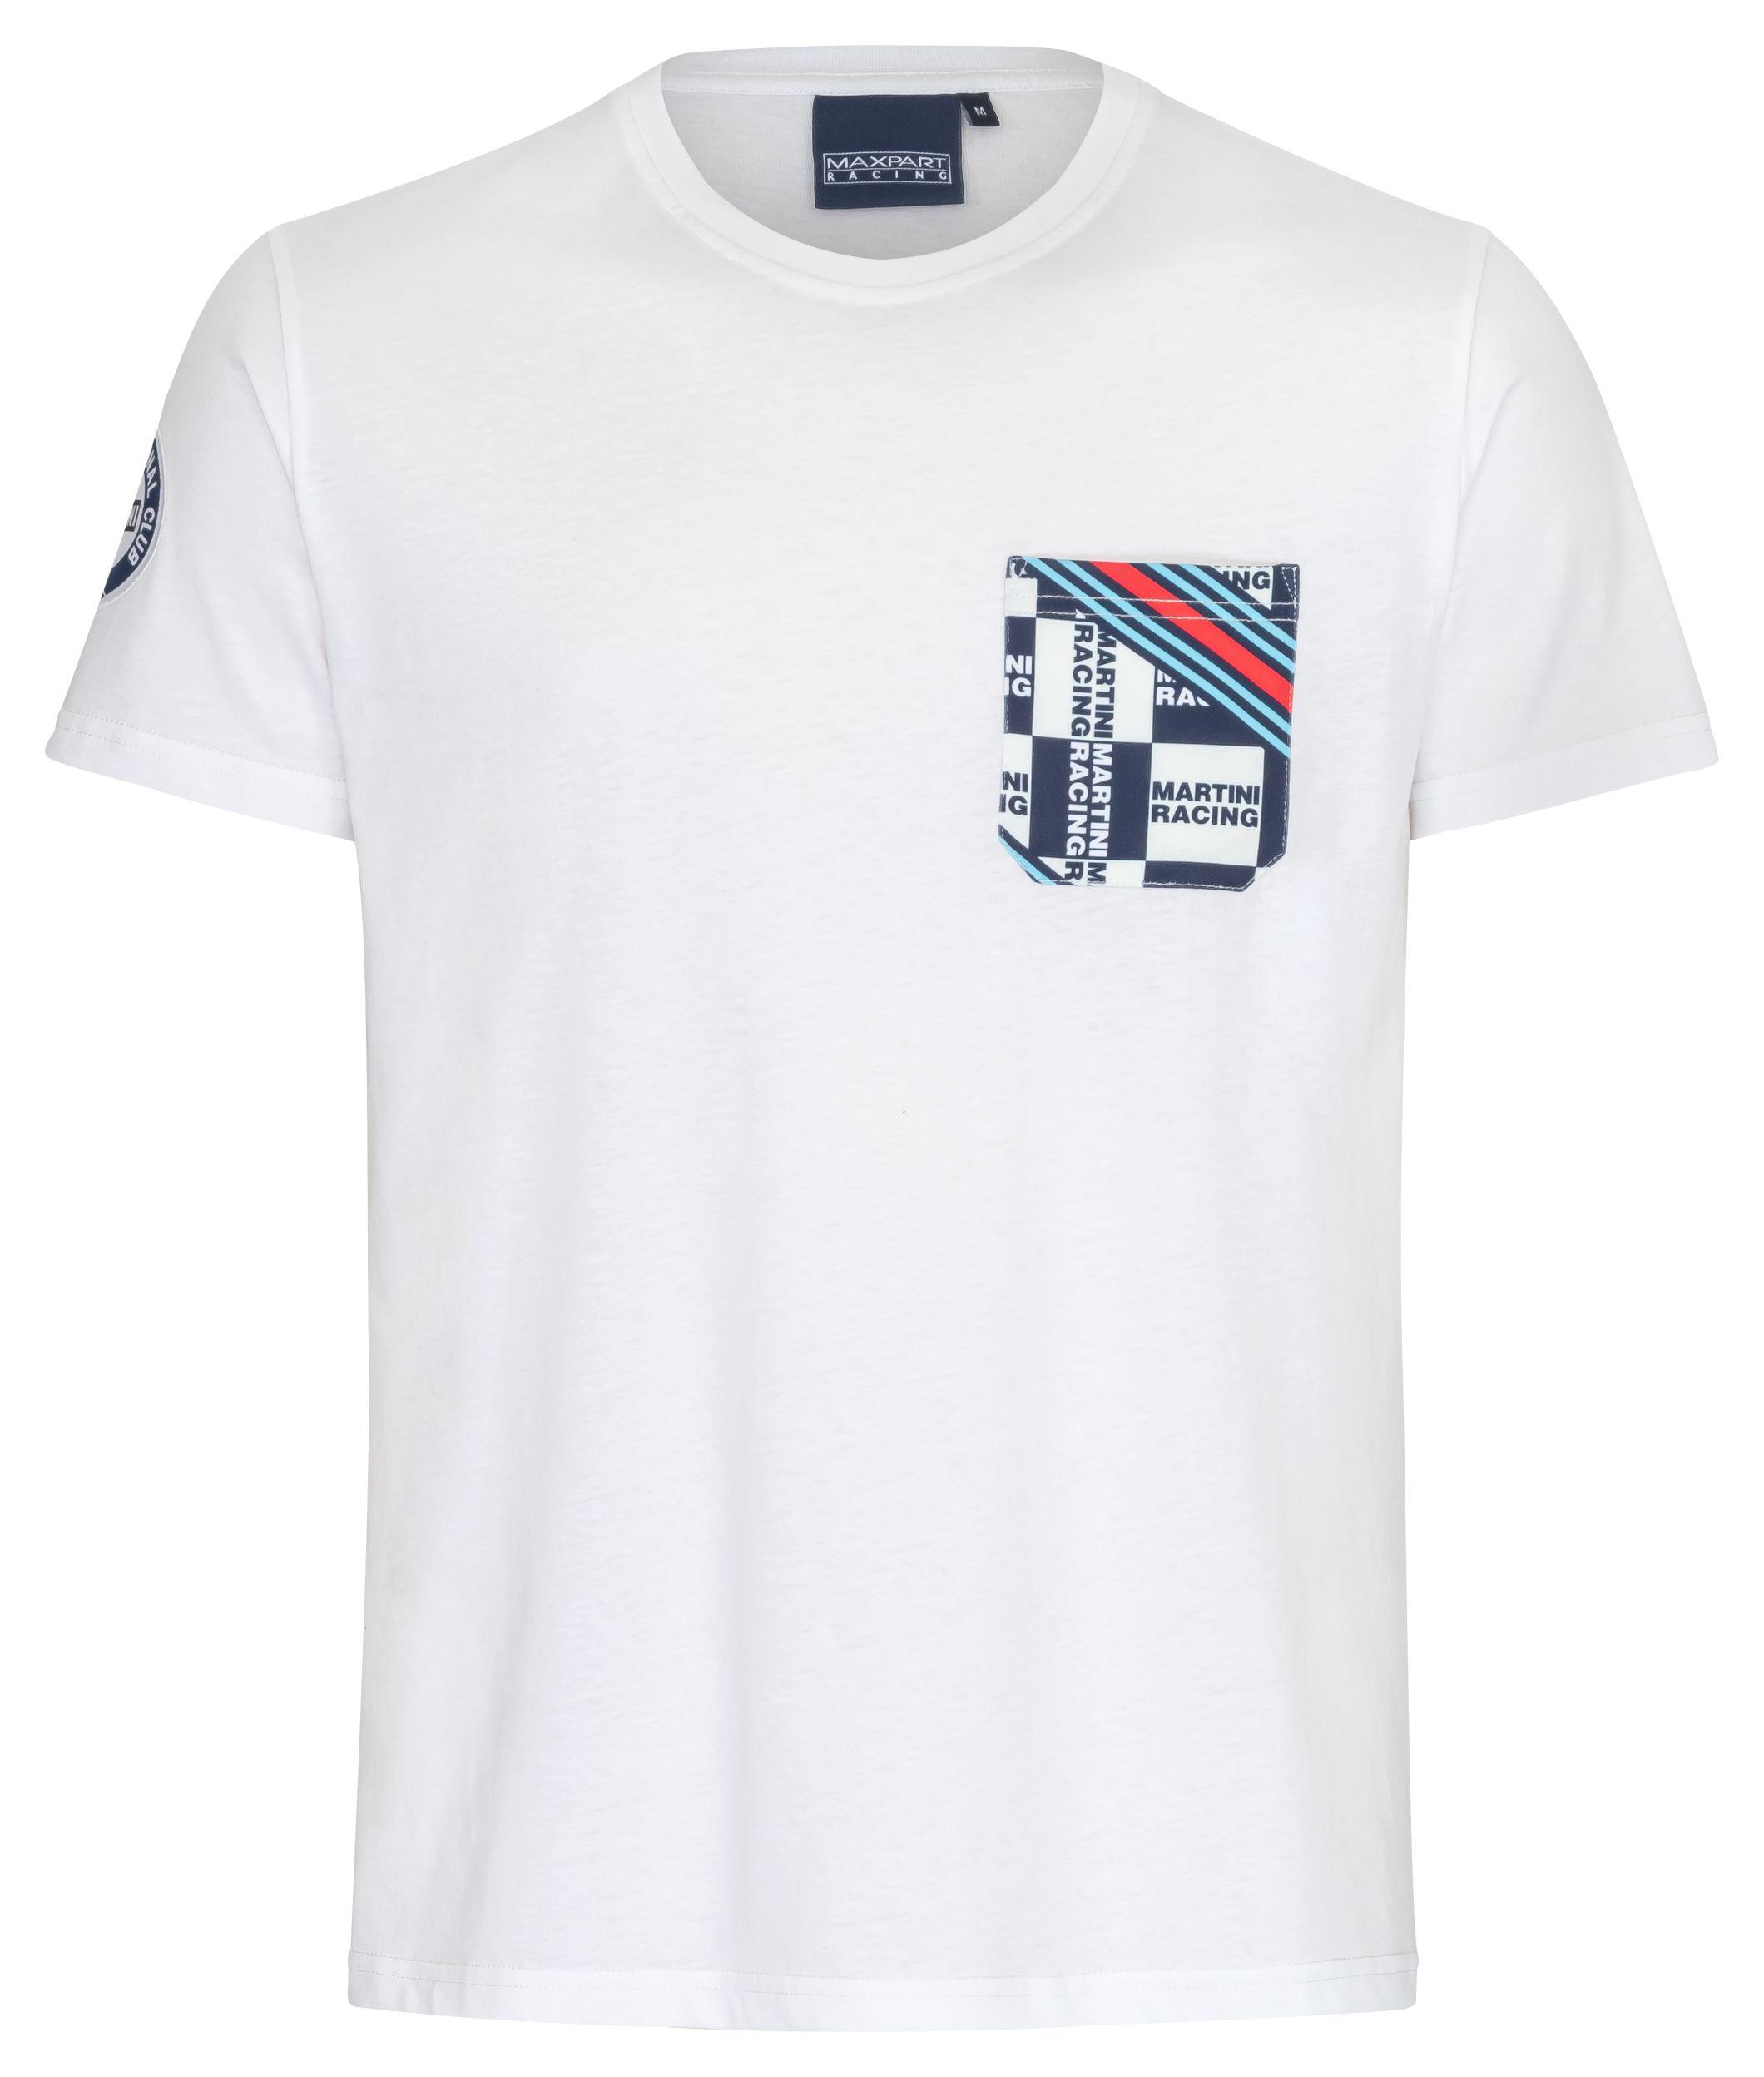 MARTINI RACING Pocket T-Shirt